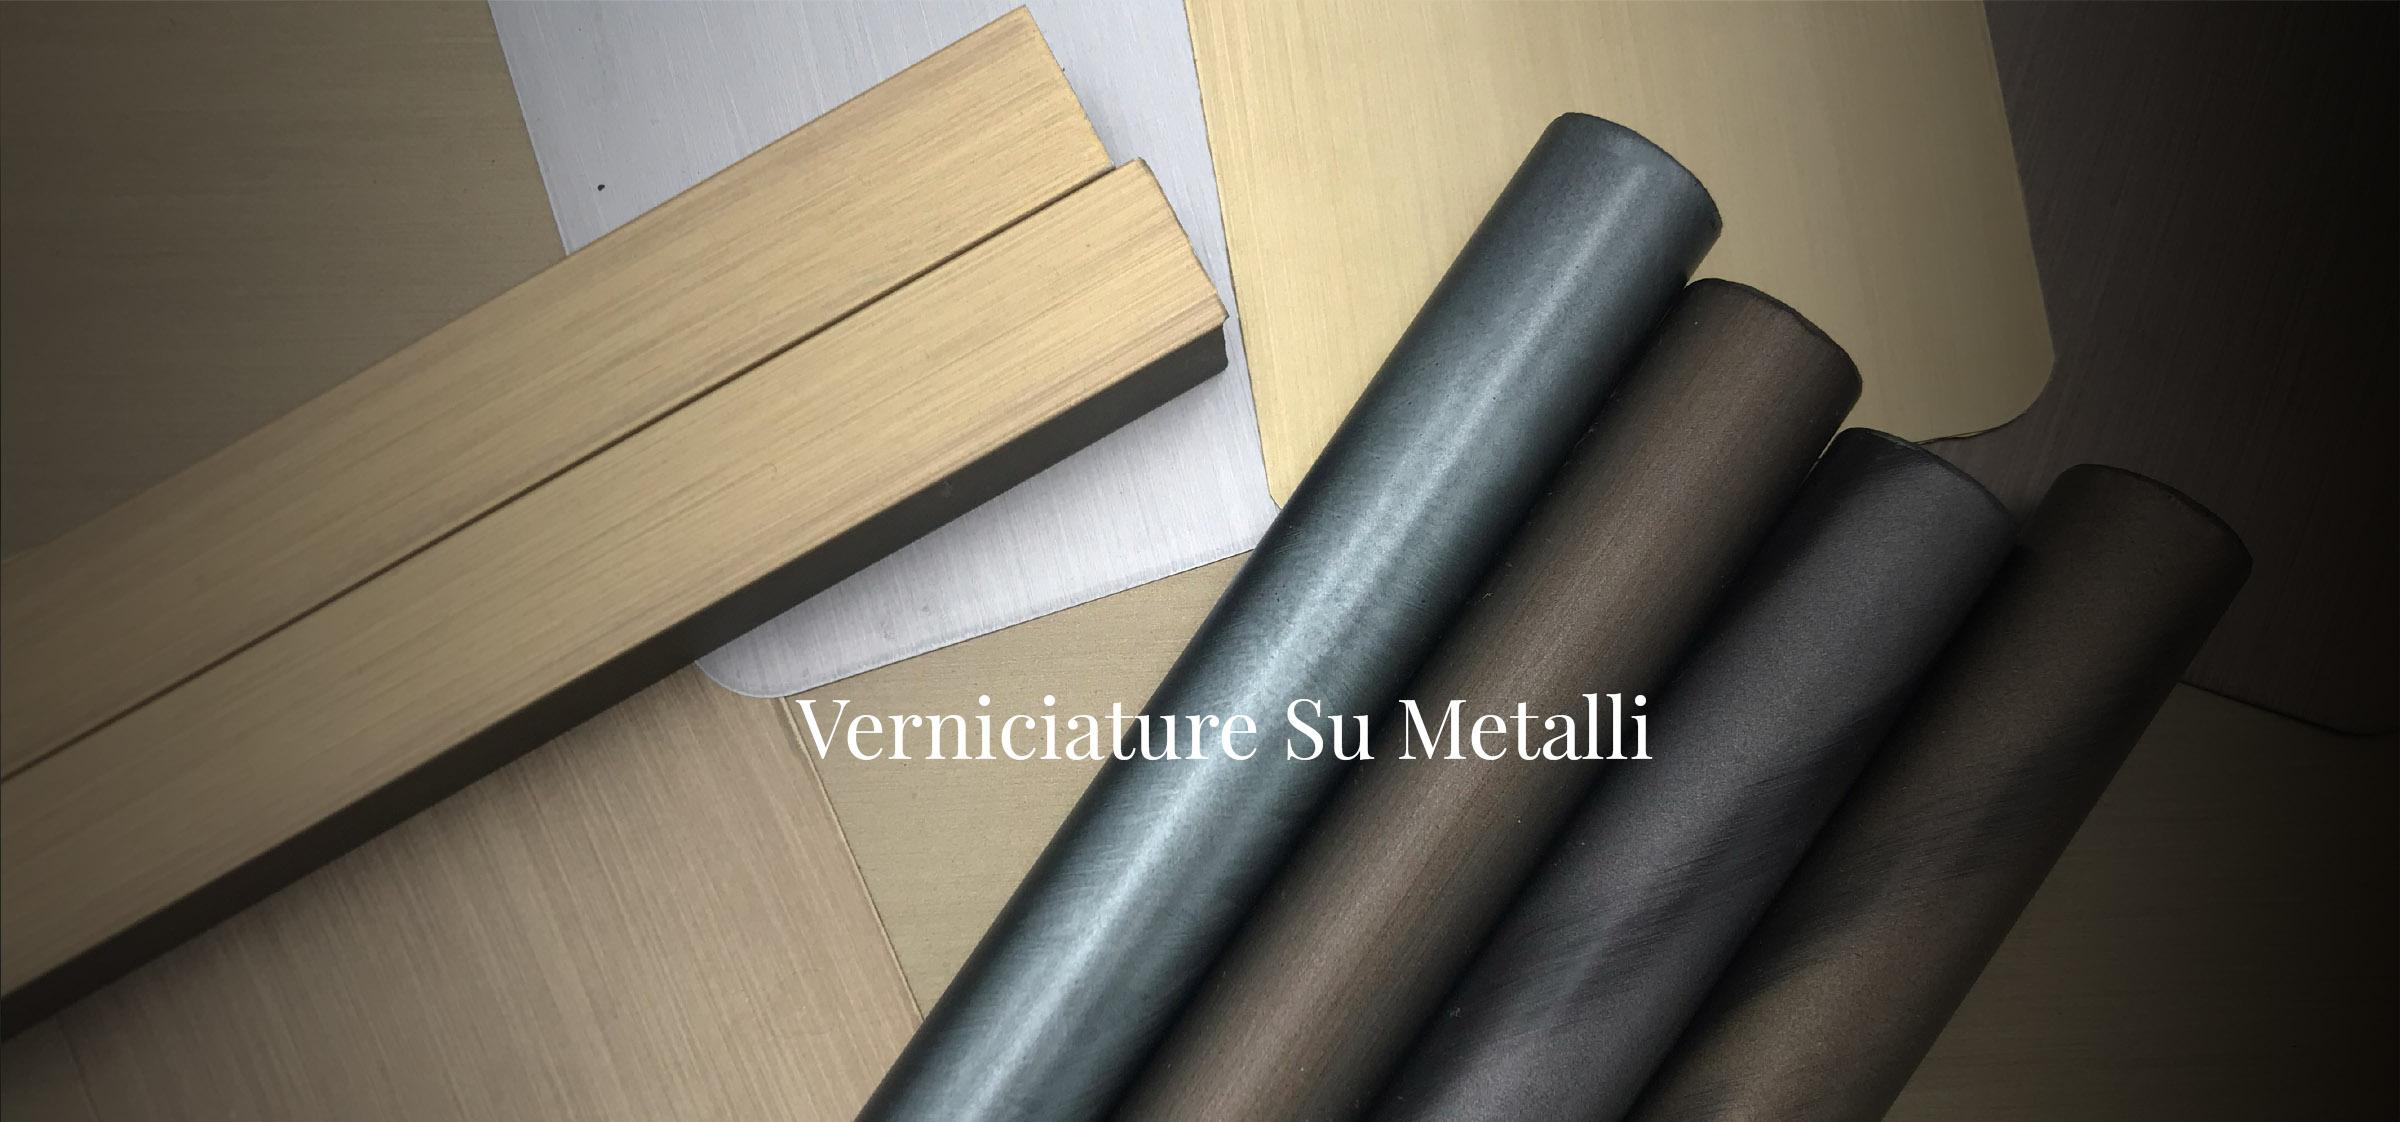 verniciature su metalli